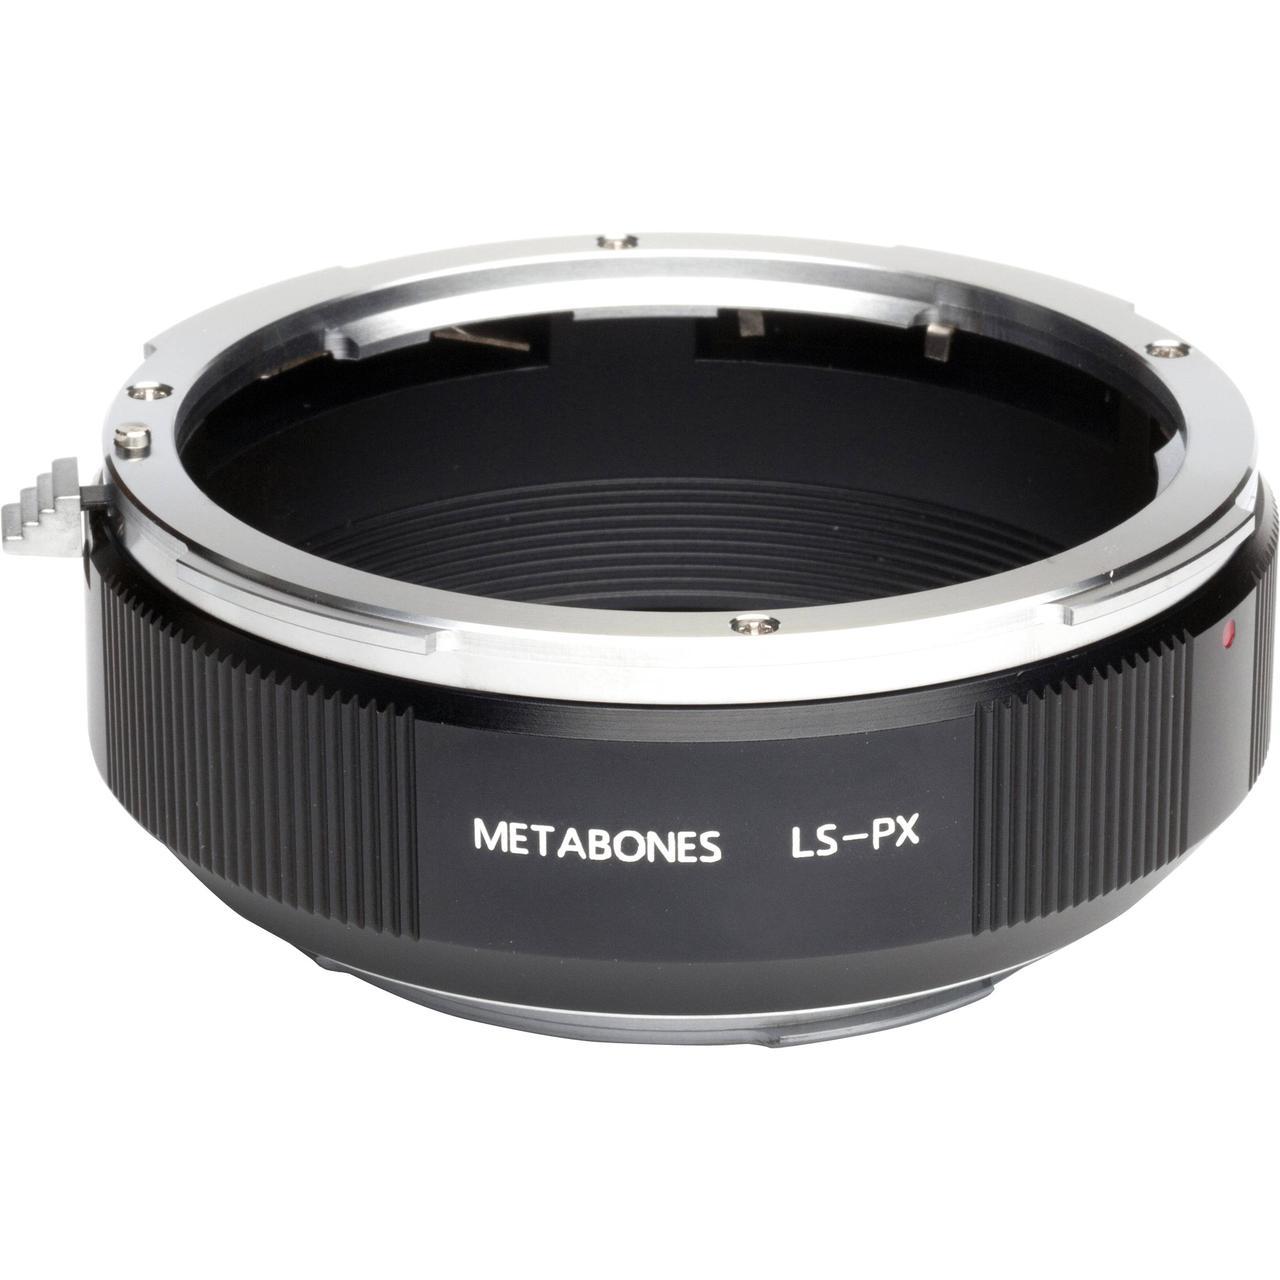 Metabones Pentax 67 Lens to Leica S Camera Lens Mount Adapter (MB_PK67-LS-BM1)